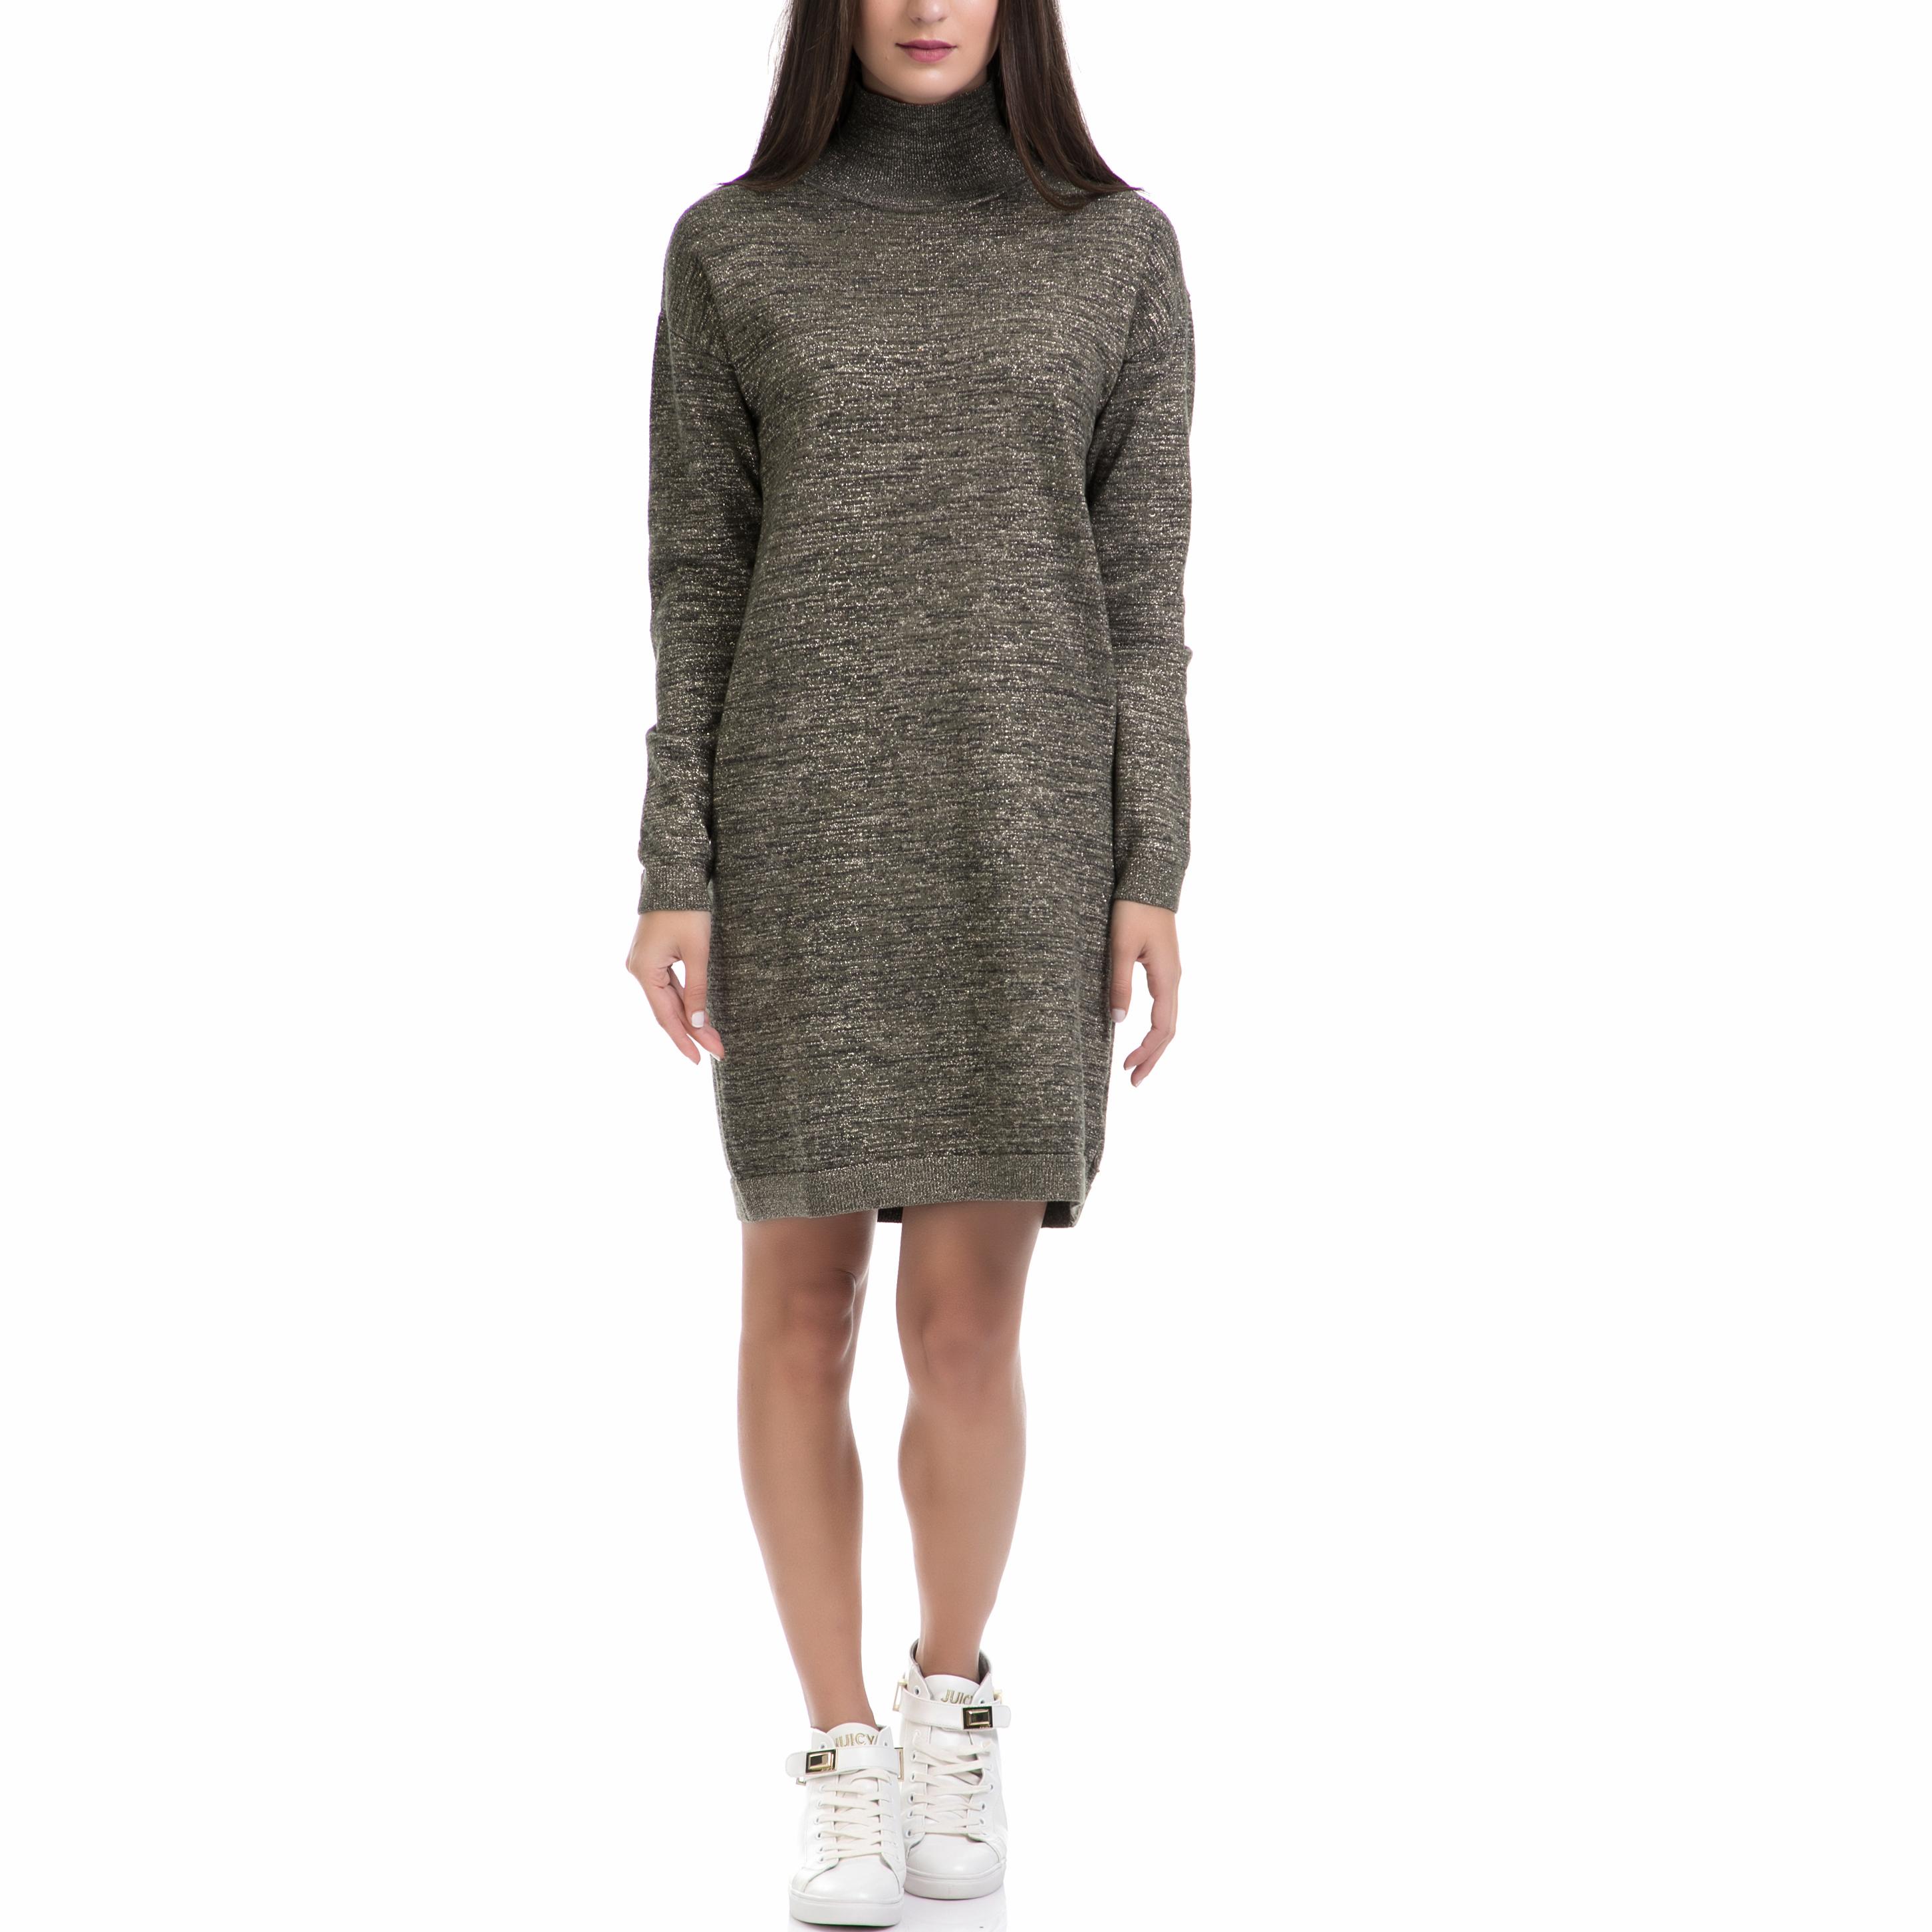 MAISON SCOTCH - Γυναικείο φόρεμα MAISON SCOTCH λαδί γυναικεία ρούχα φορέματα μίνι